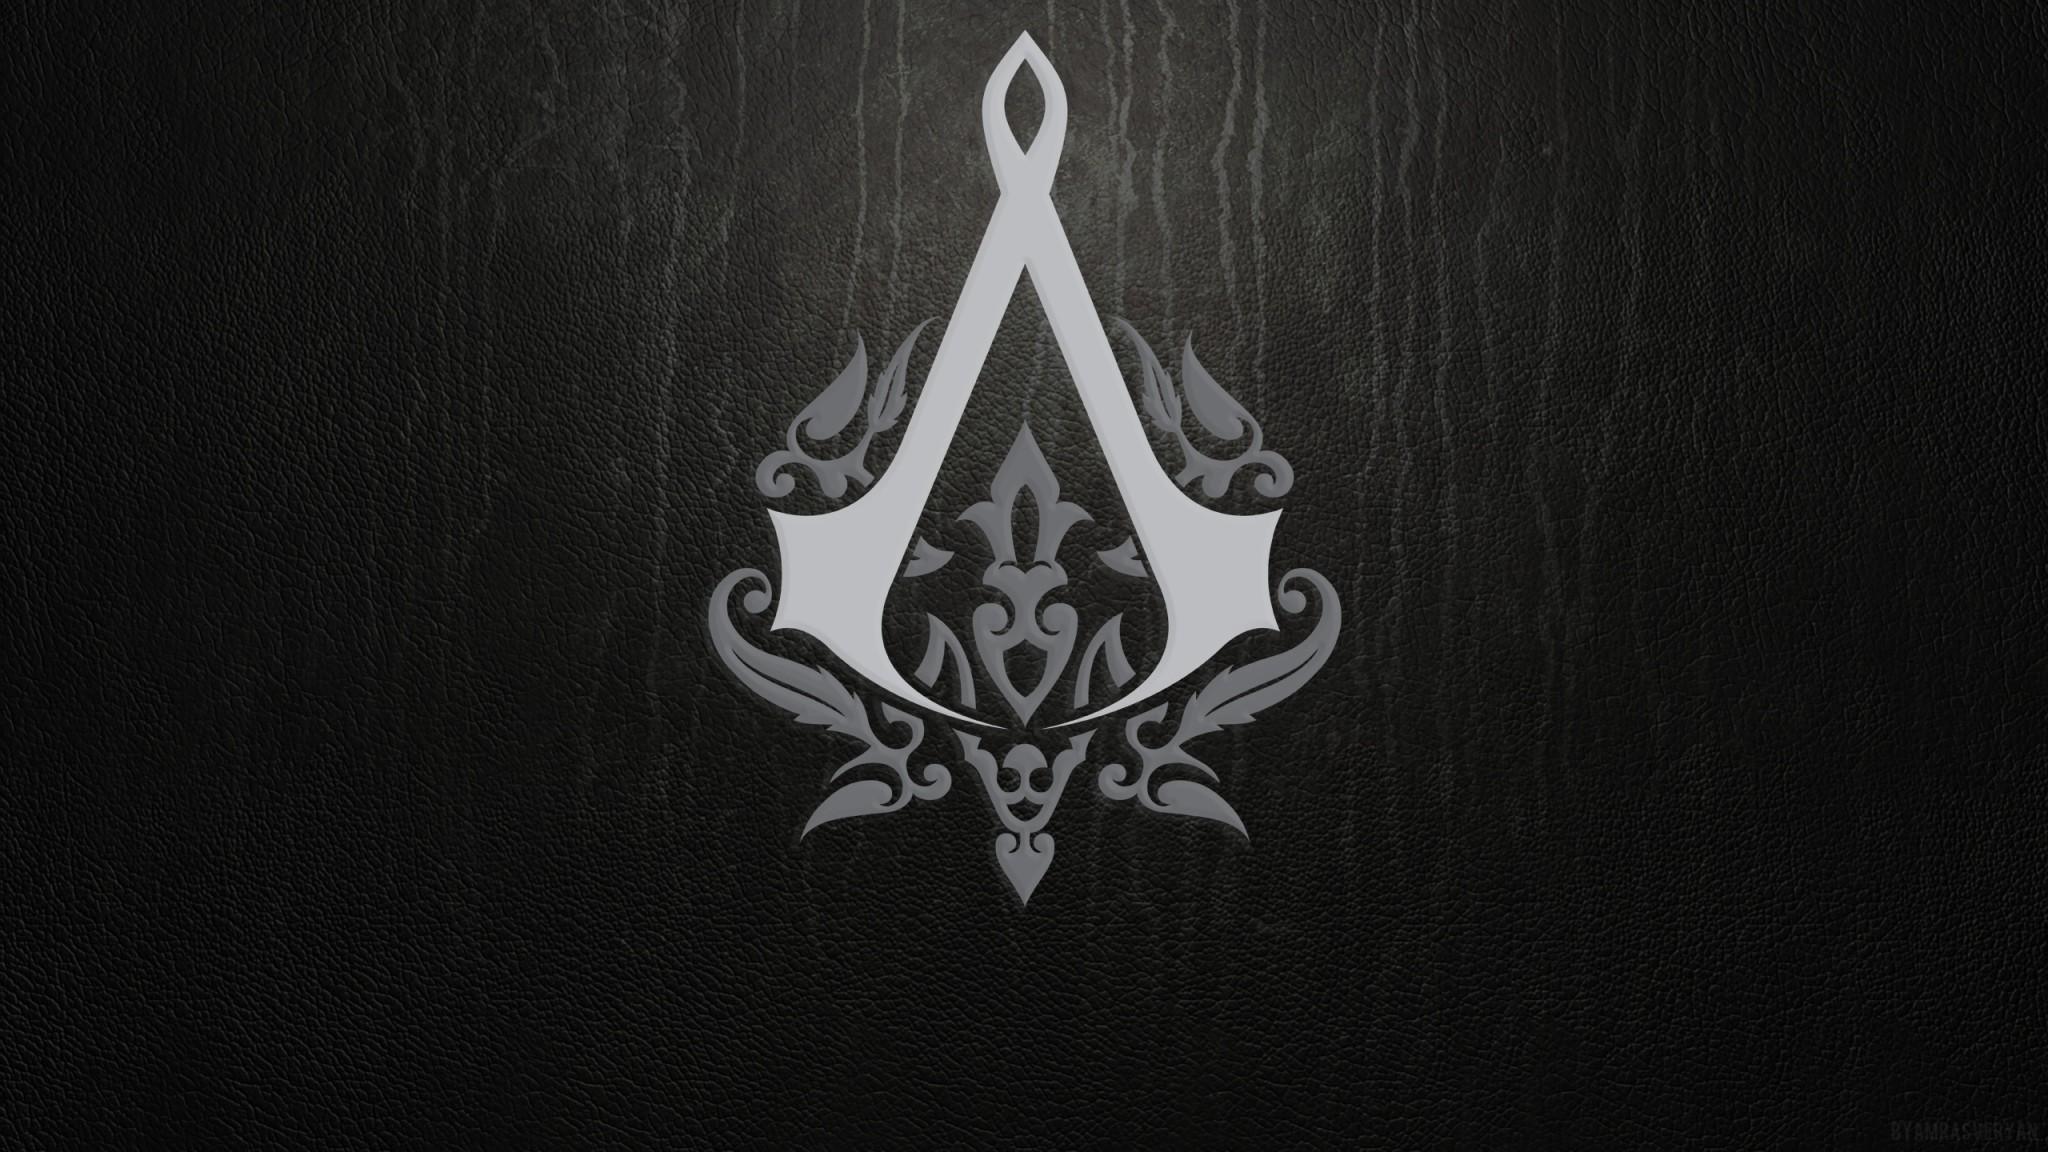 Wallpaper assassins creed, emblem, background, sign